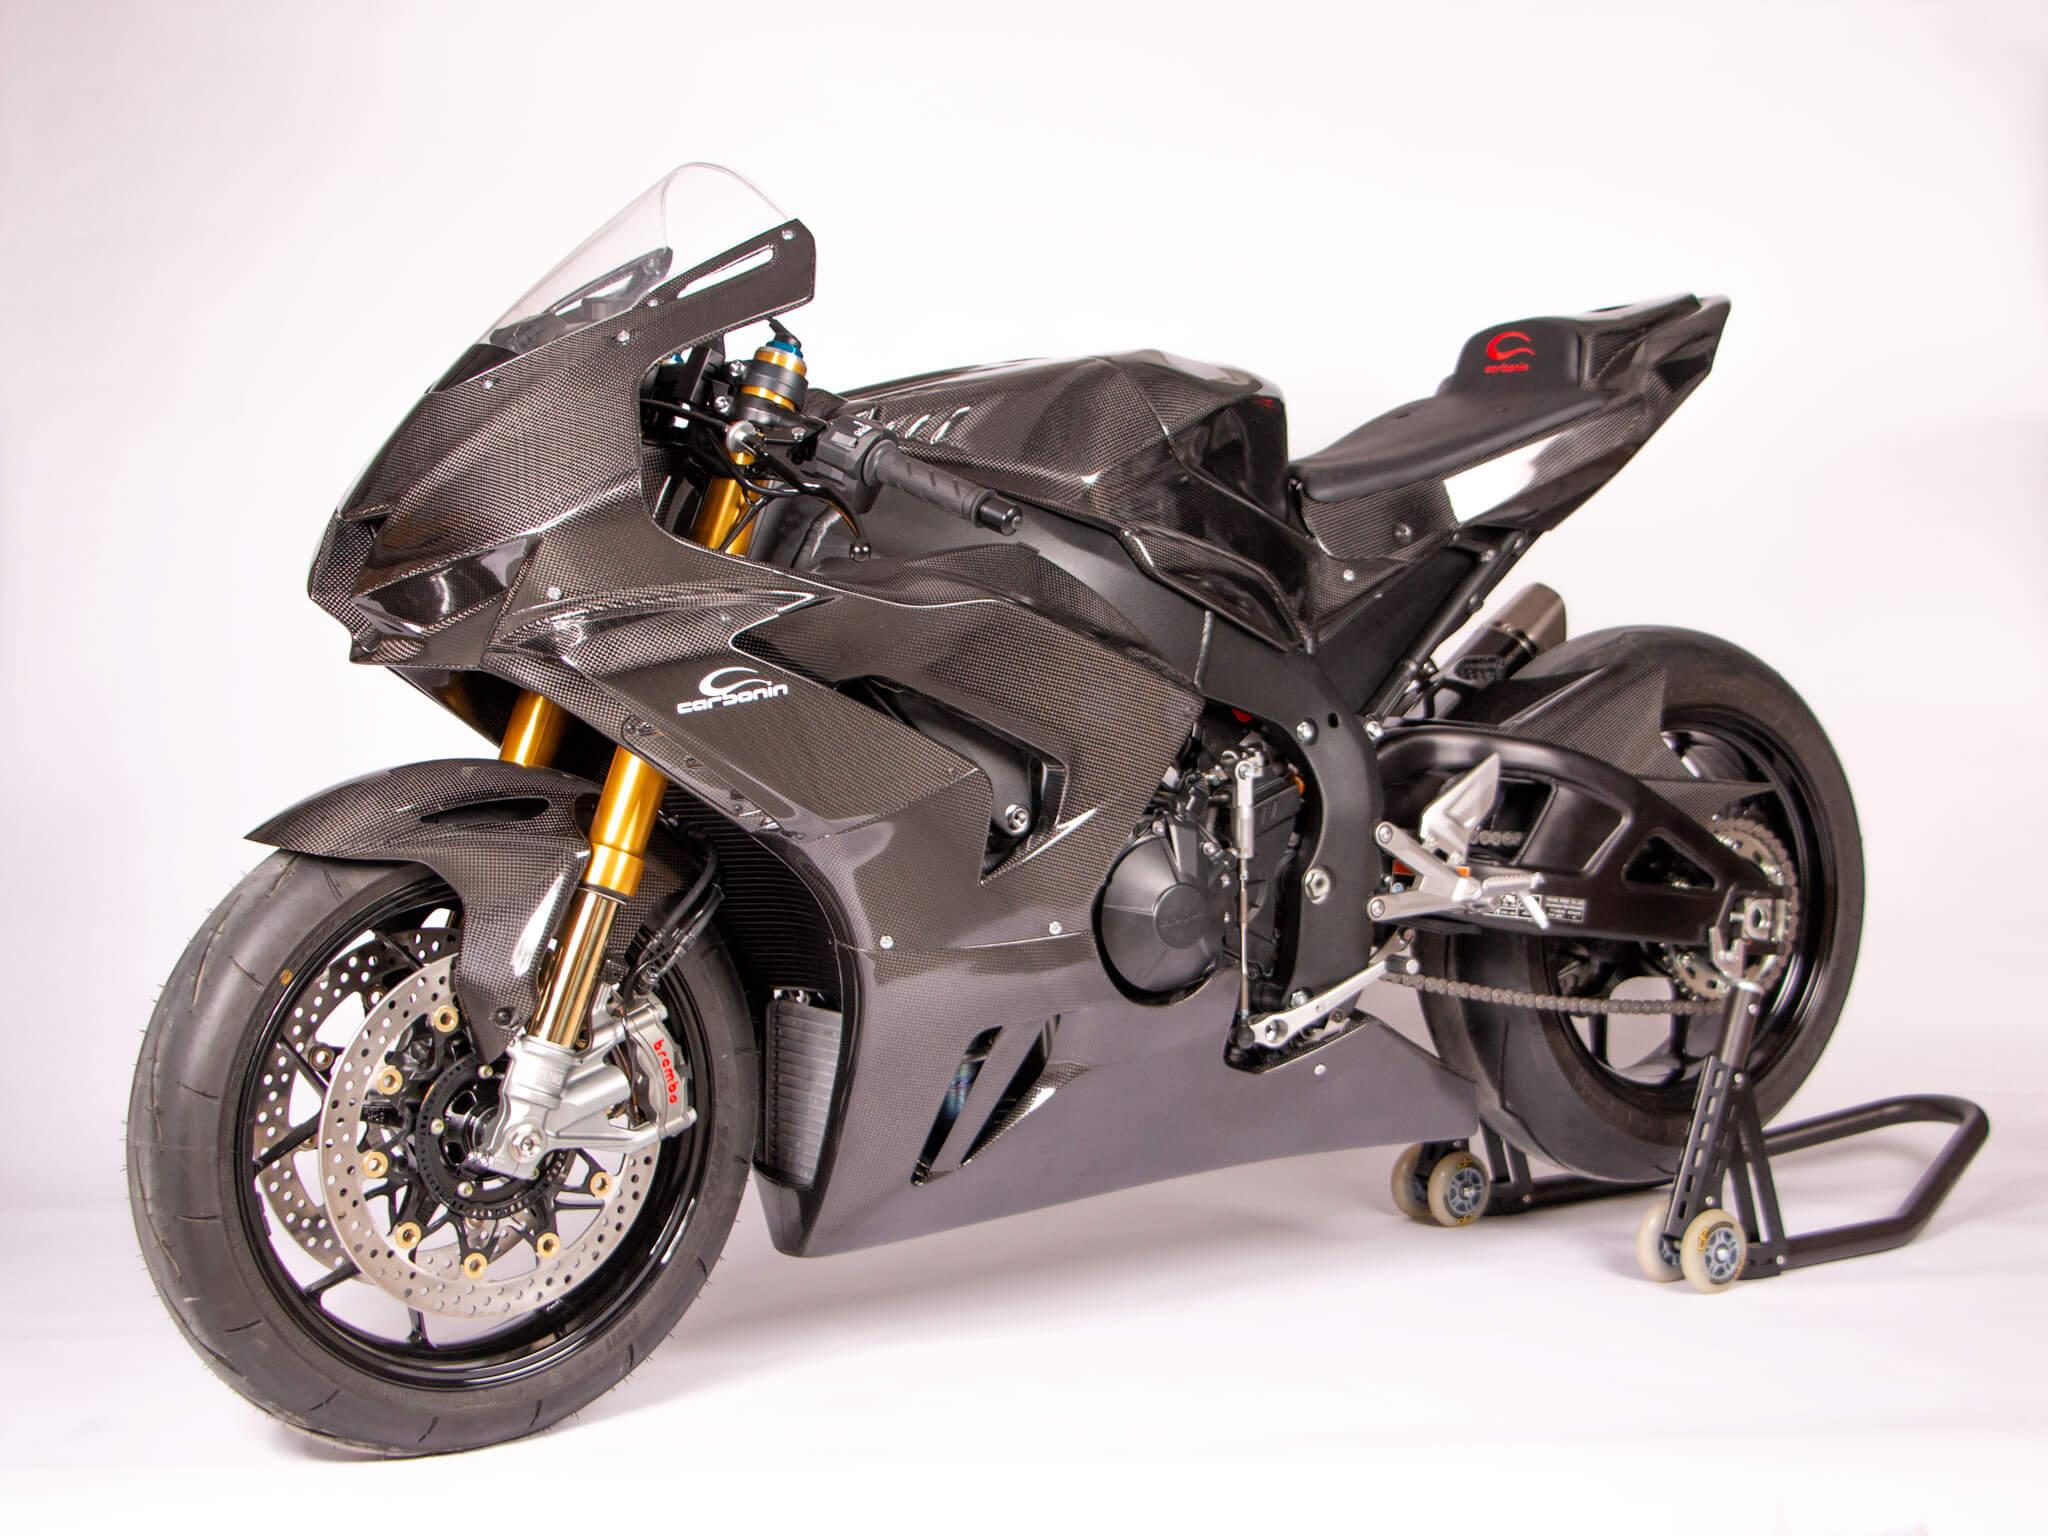 Product Release 2020 Honda Cbr1000rr R Fireblade Sp Carbonin Avio And Carbon Fibre Race Fairings Carbonin Com